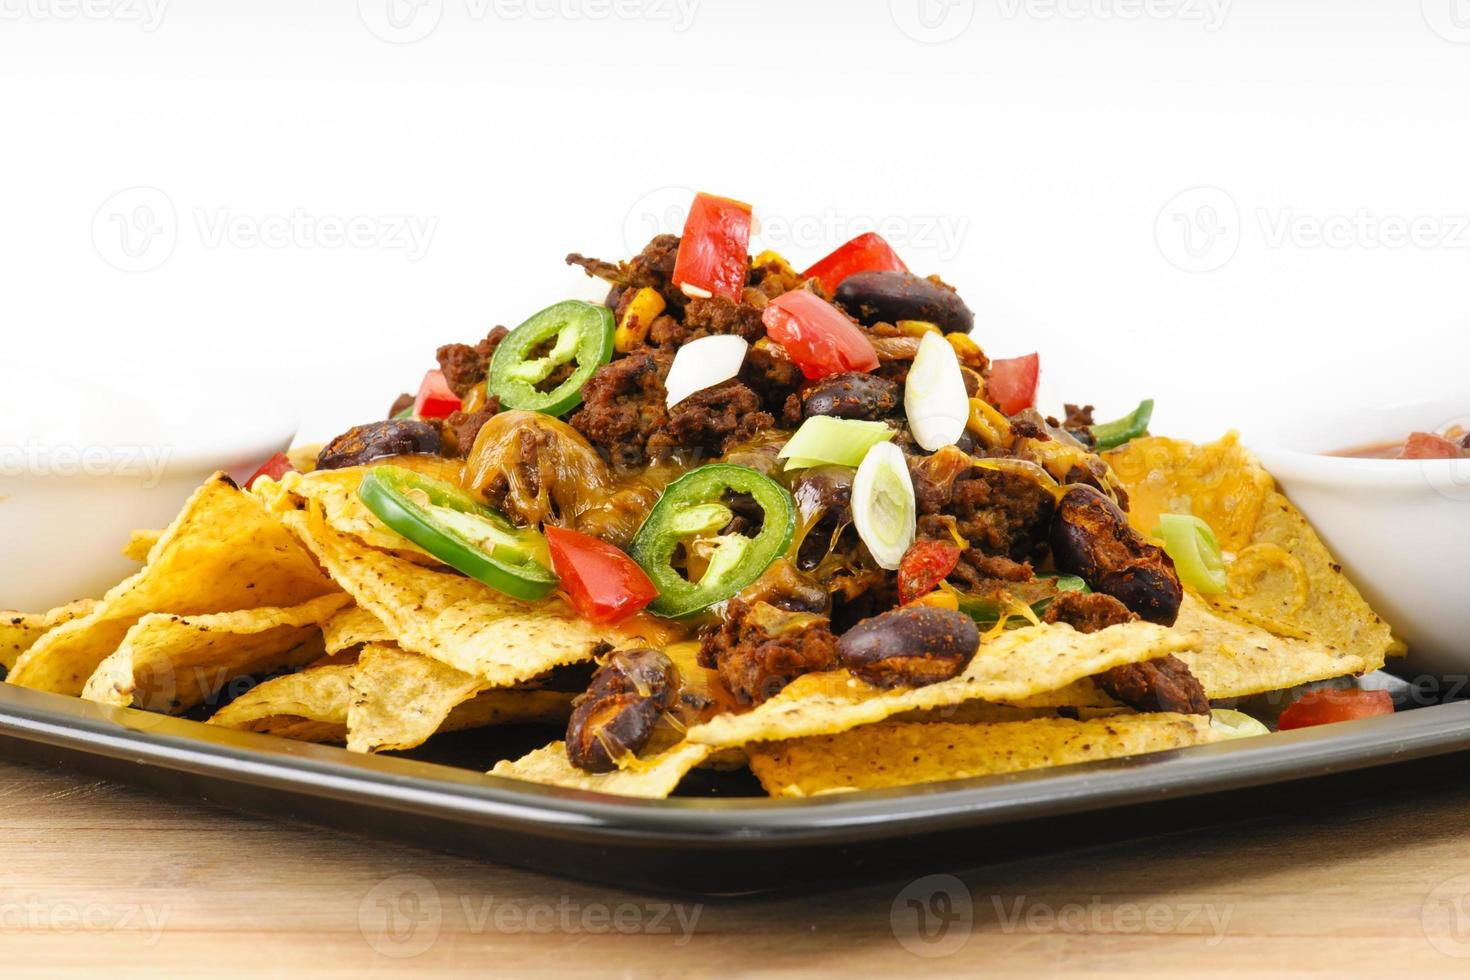 lanche de nacho com queijo e pimenta foto